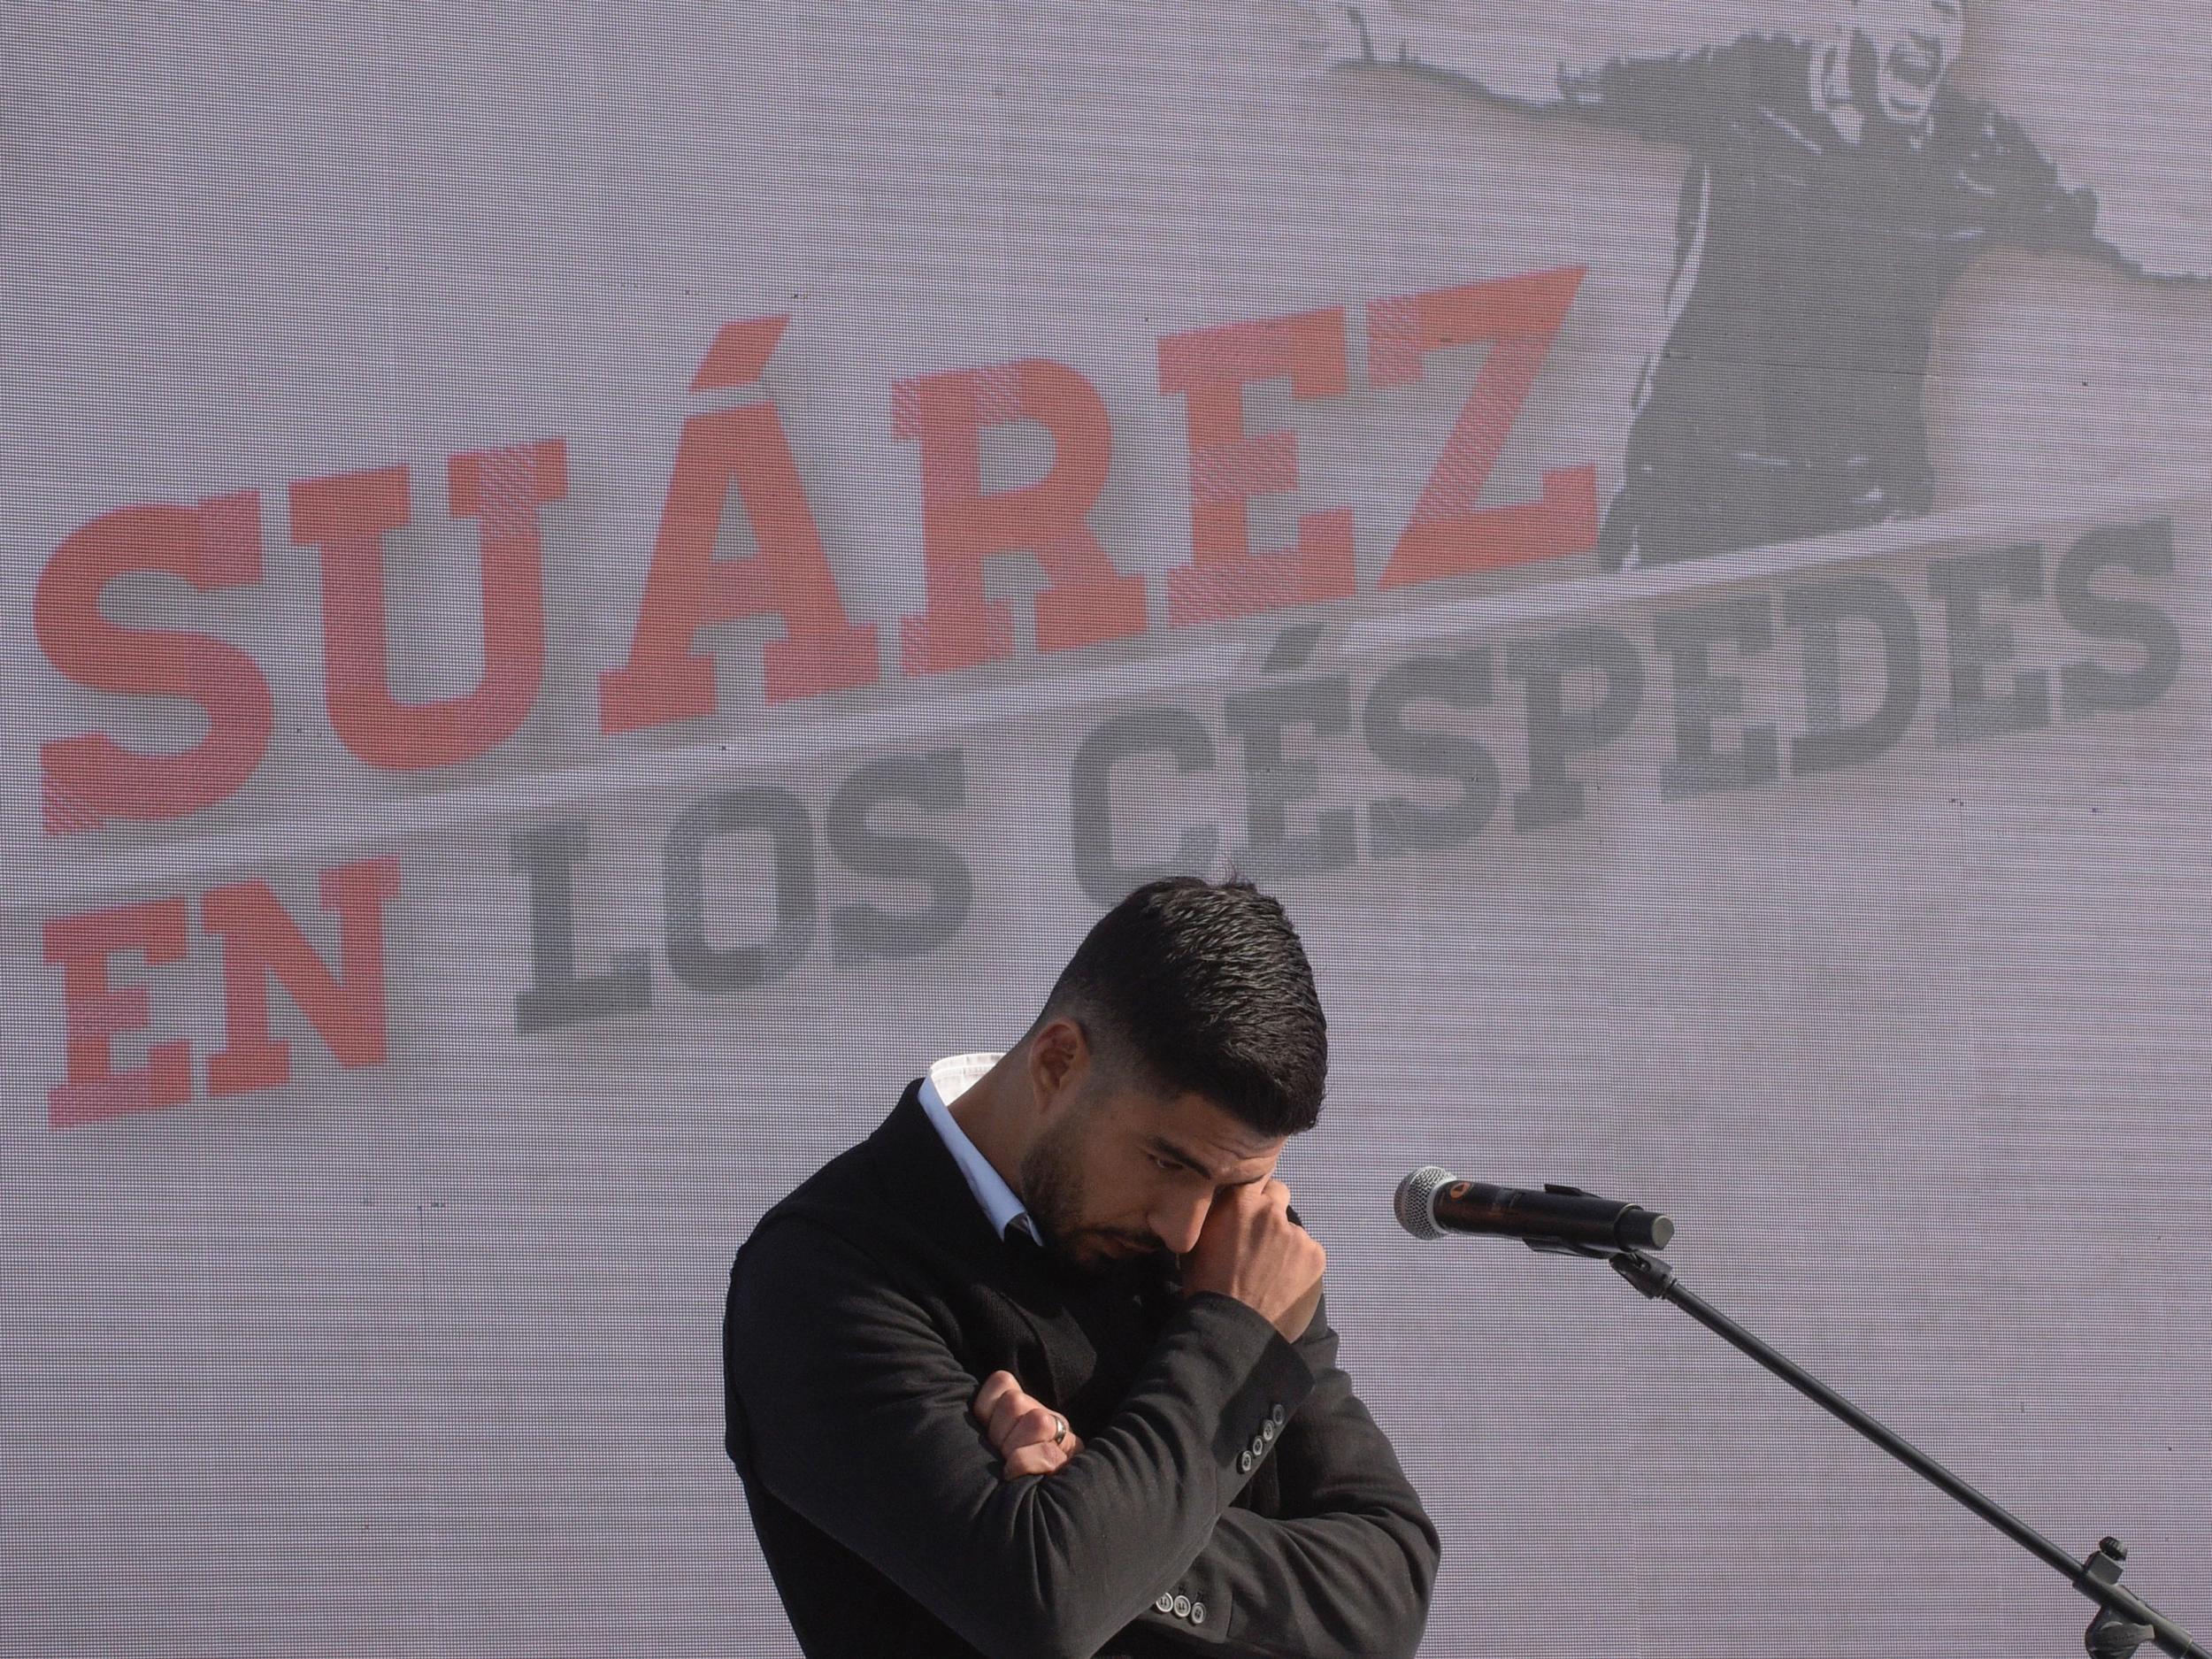 Luis Suarez breaks down in tears as he returns to boyhood club in Uruguay